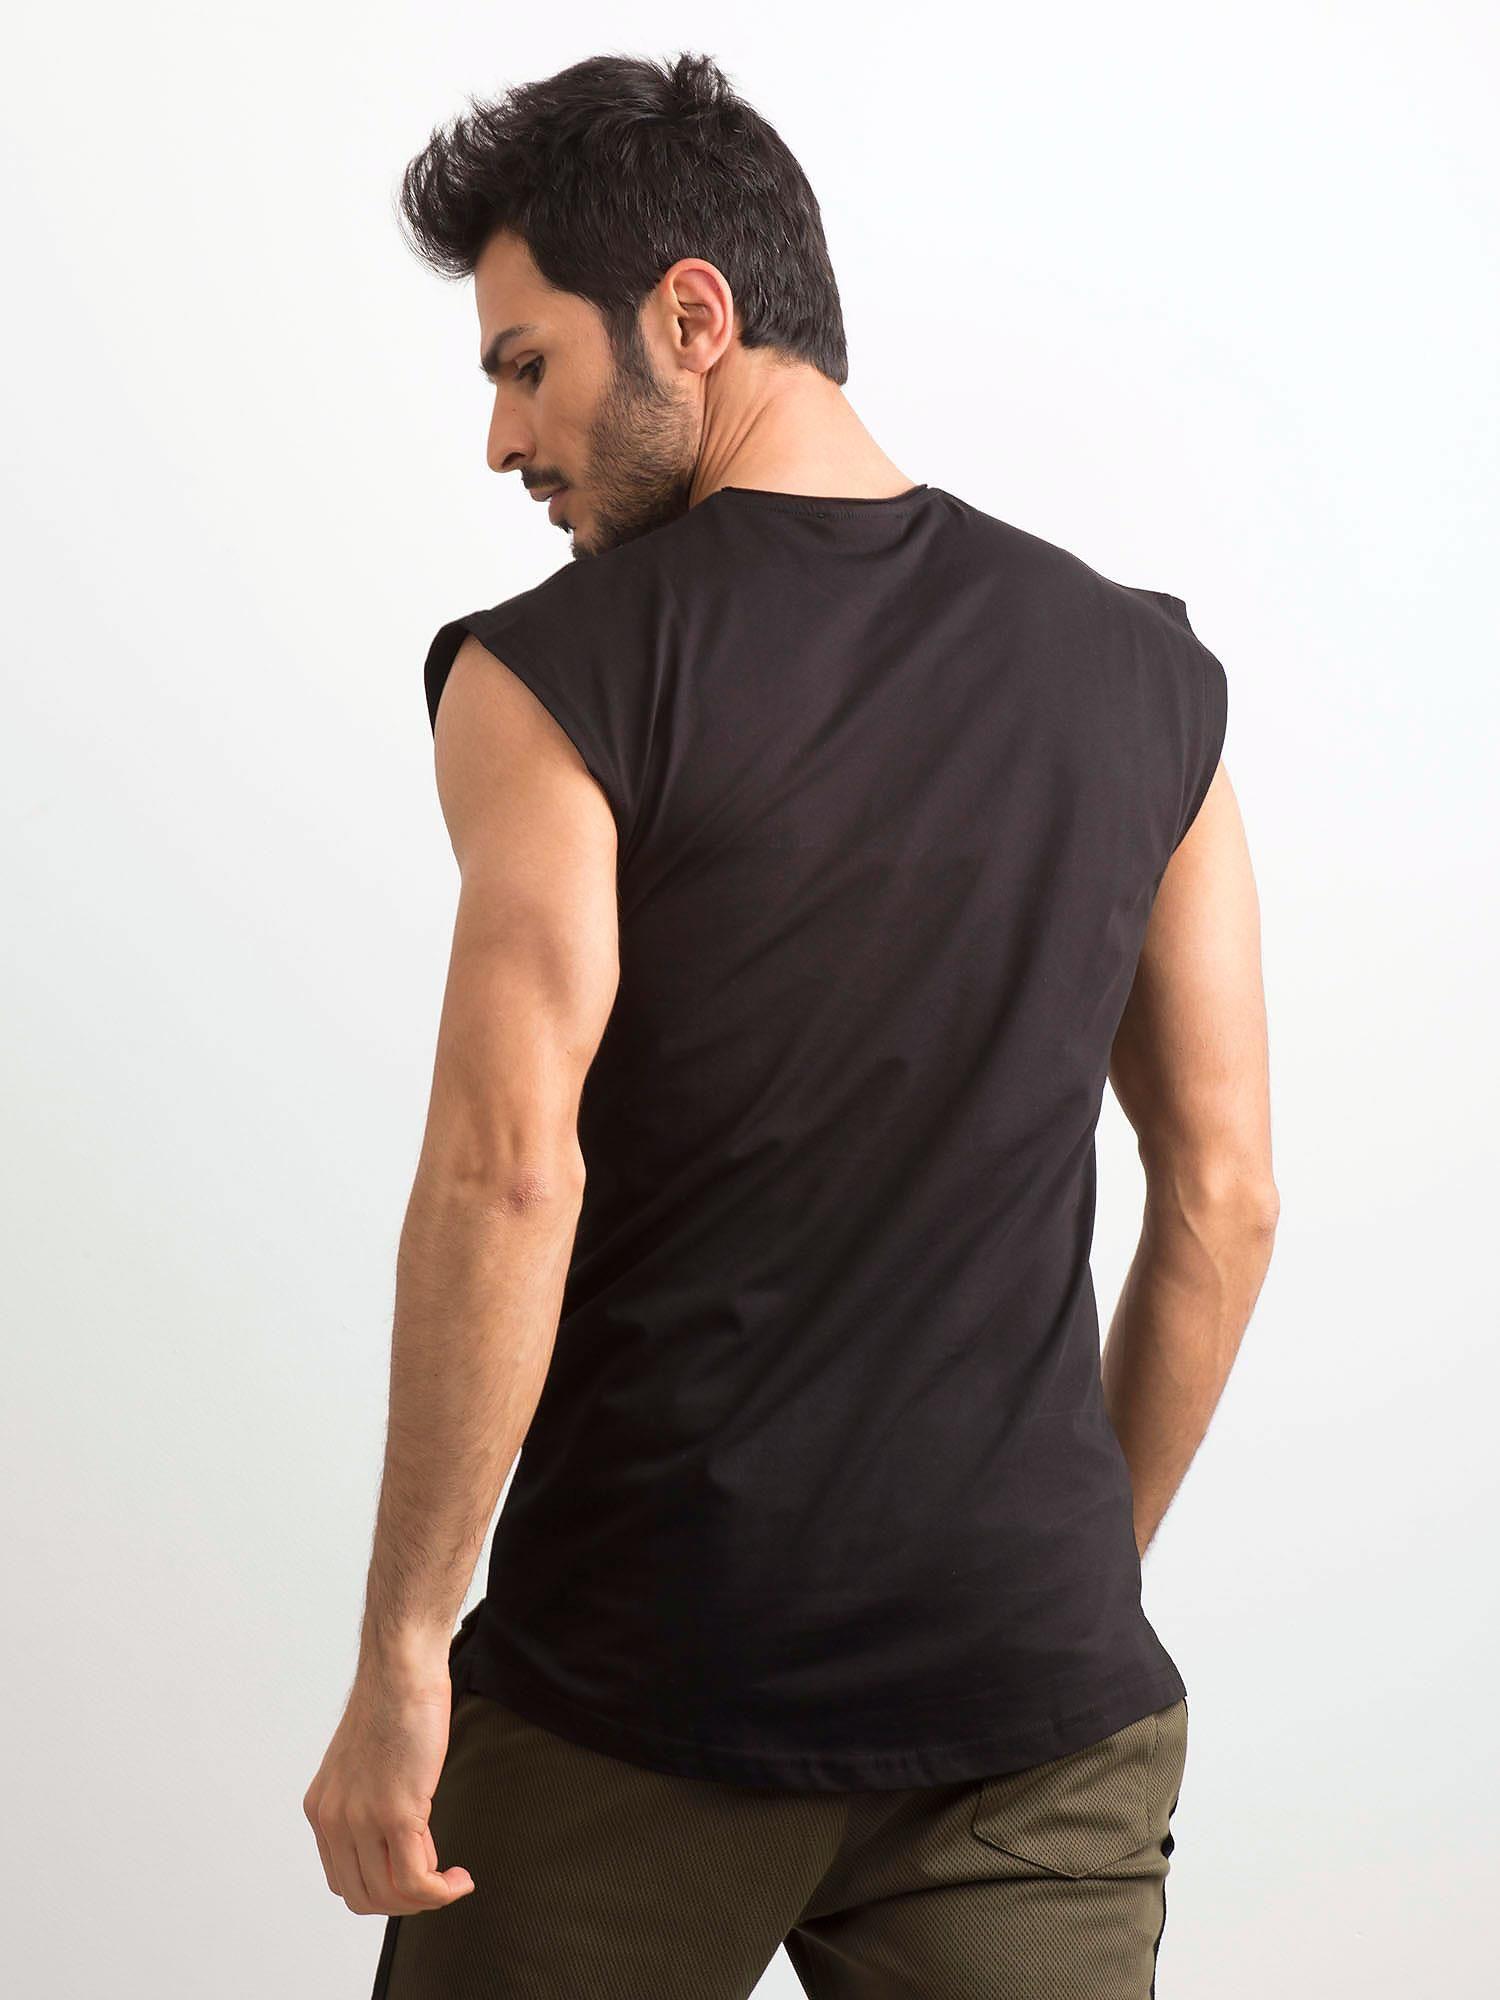 3ac3a71688e9ae Czarna koszulka męska z nadrukiem - Mężczyźni koszulka na ...